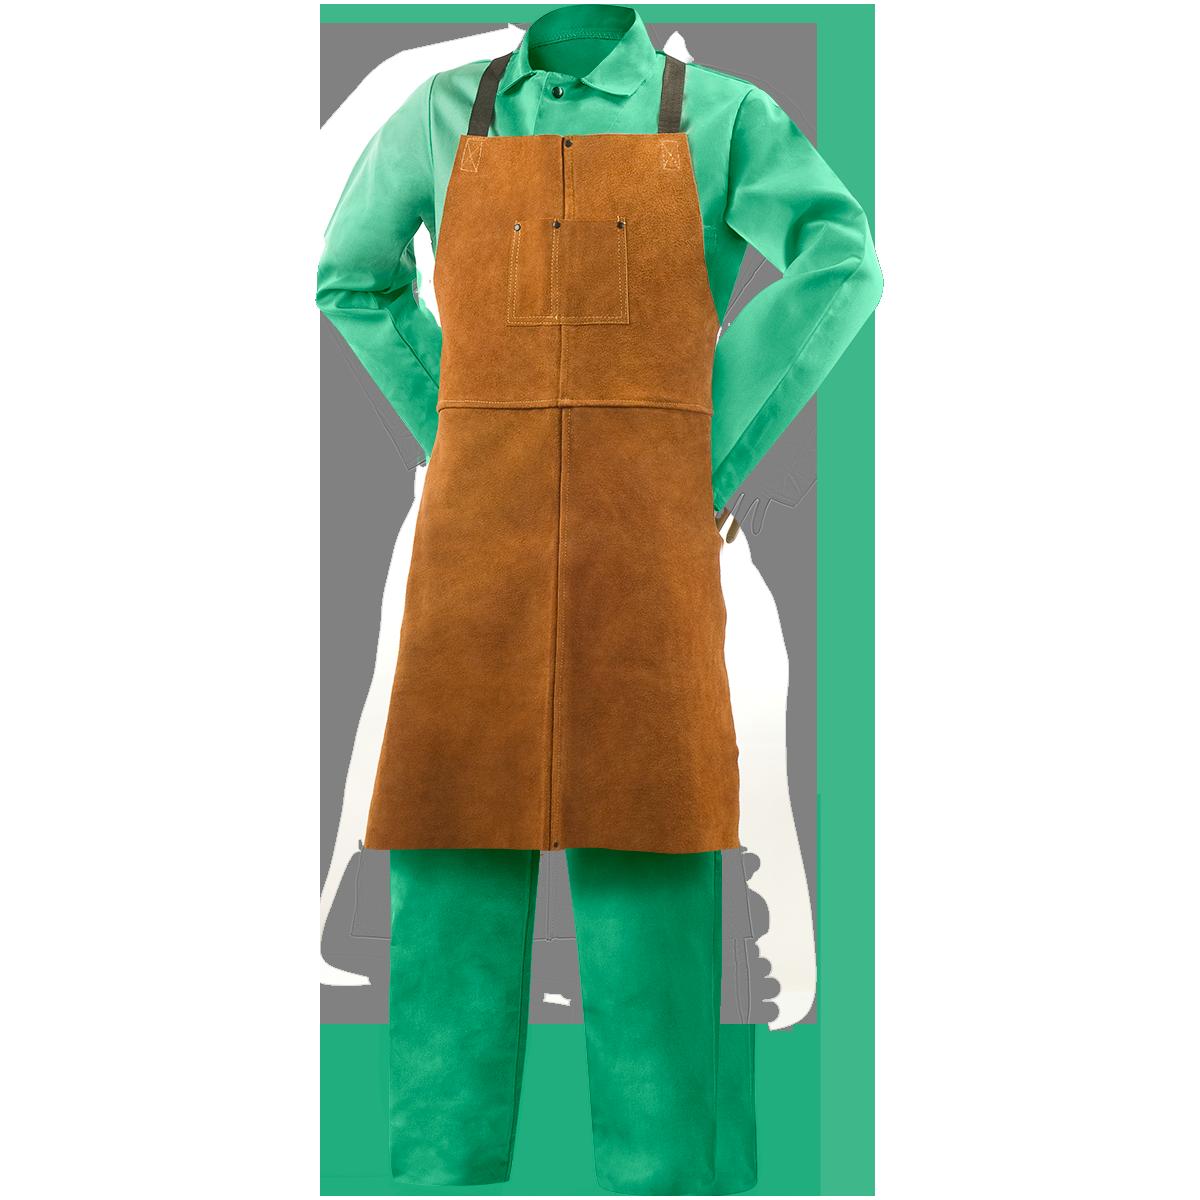 Grain cow hide leather welding apron single piece with adjustable straps